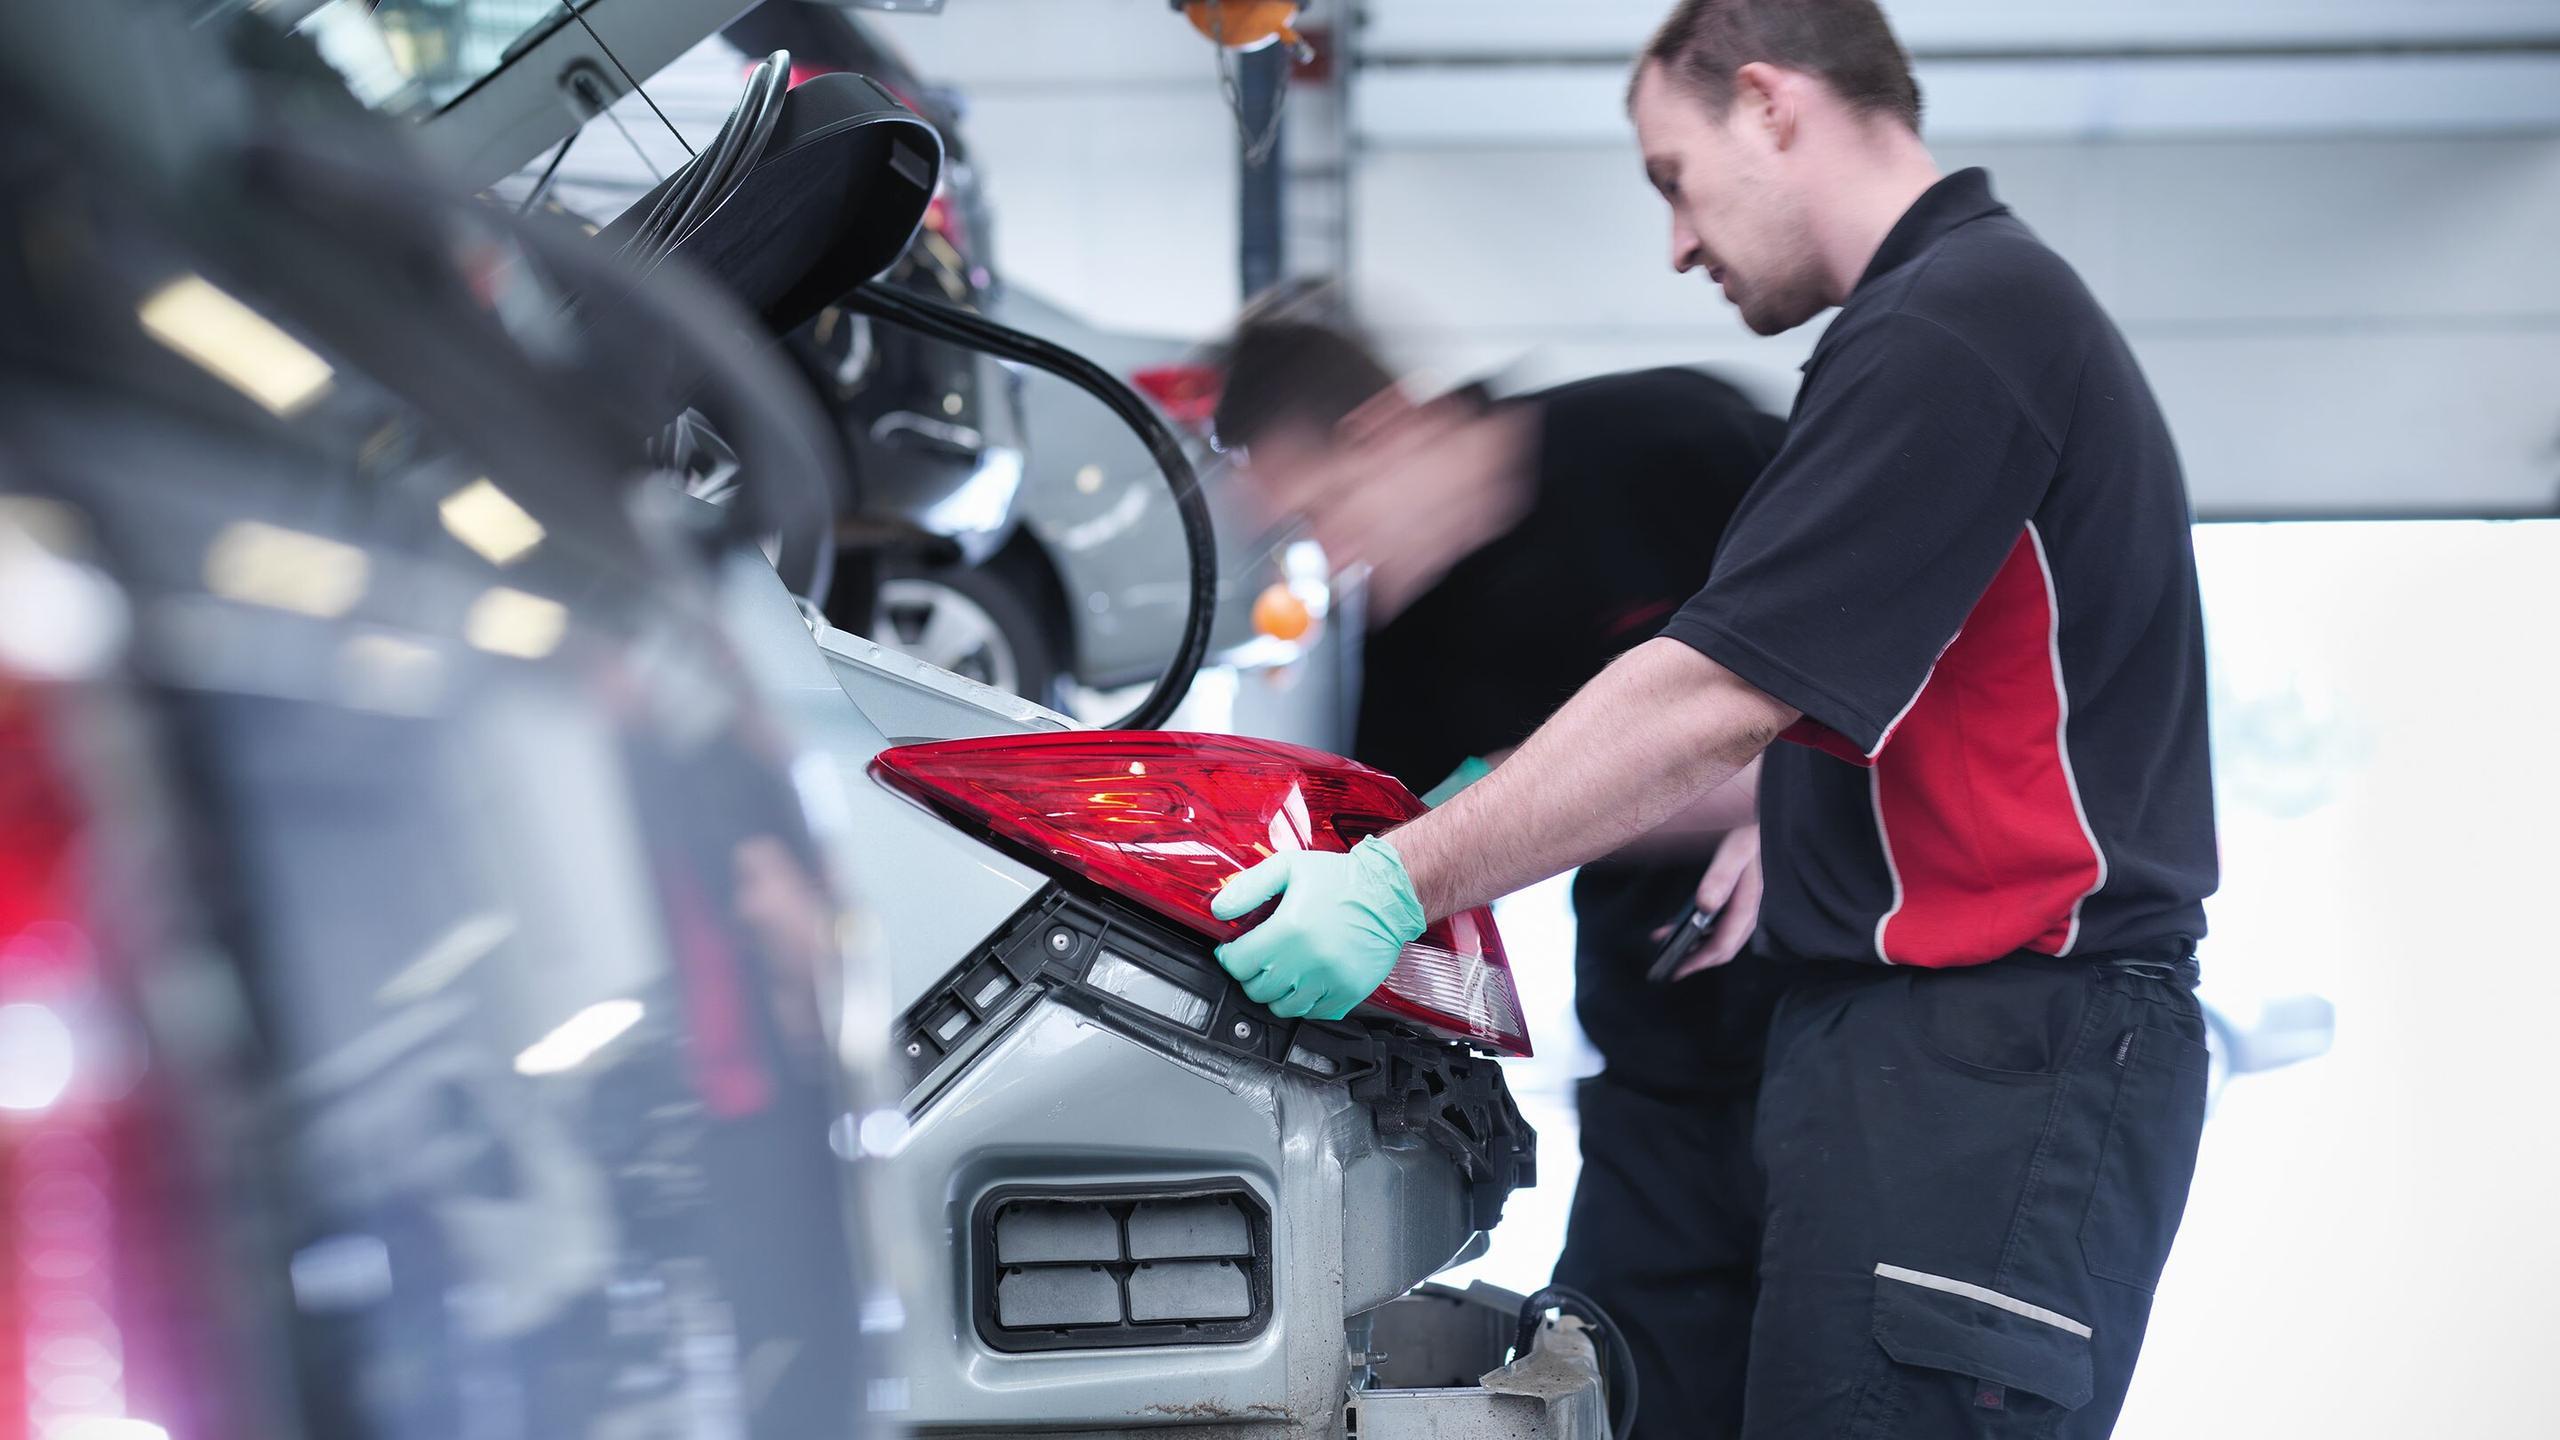 Male mechanic replacing rear tail light